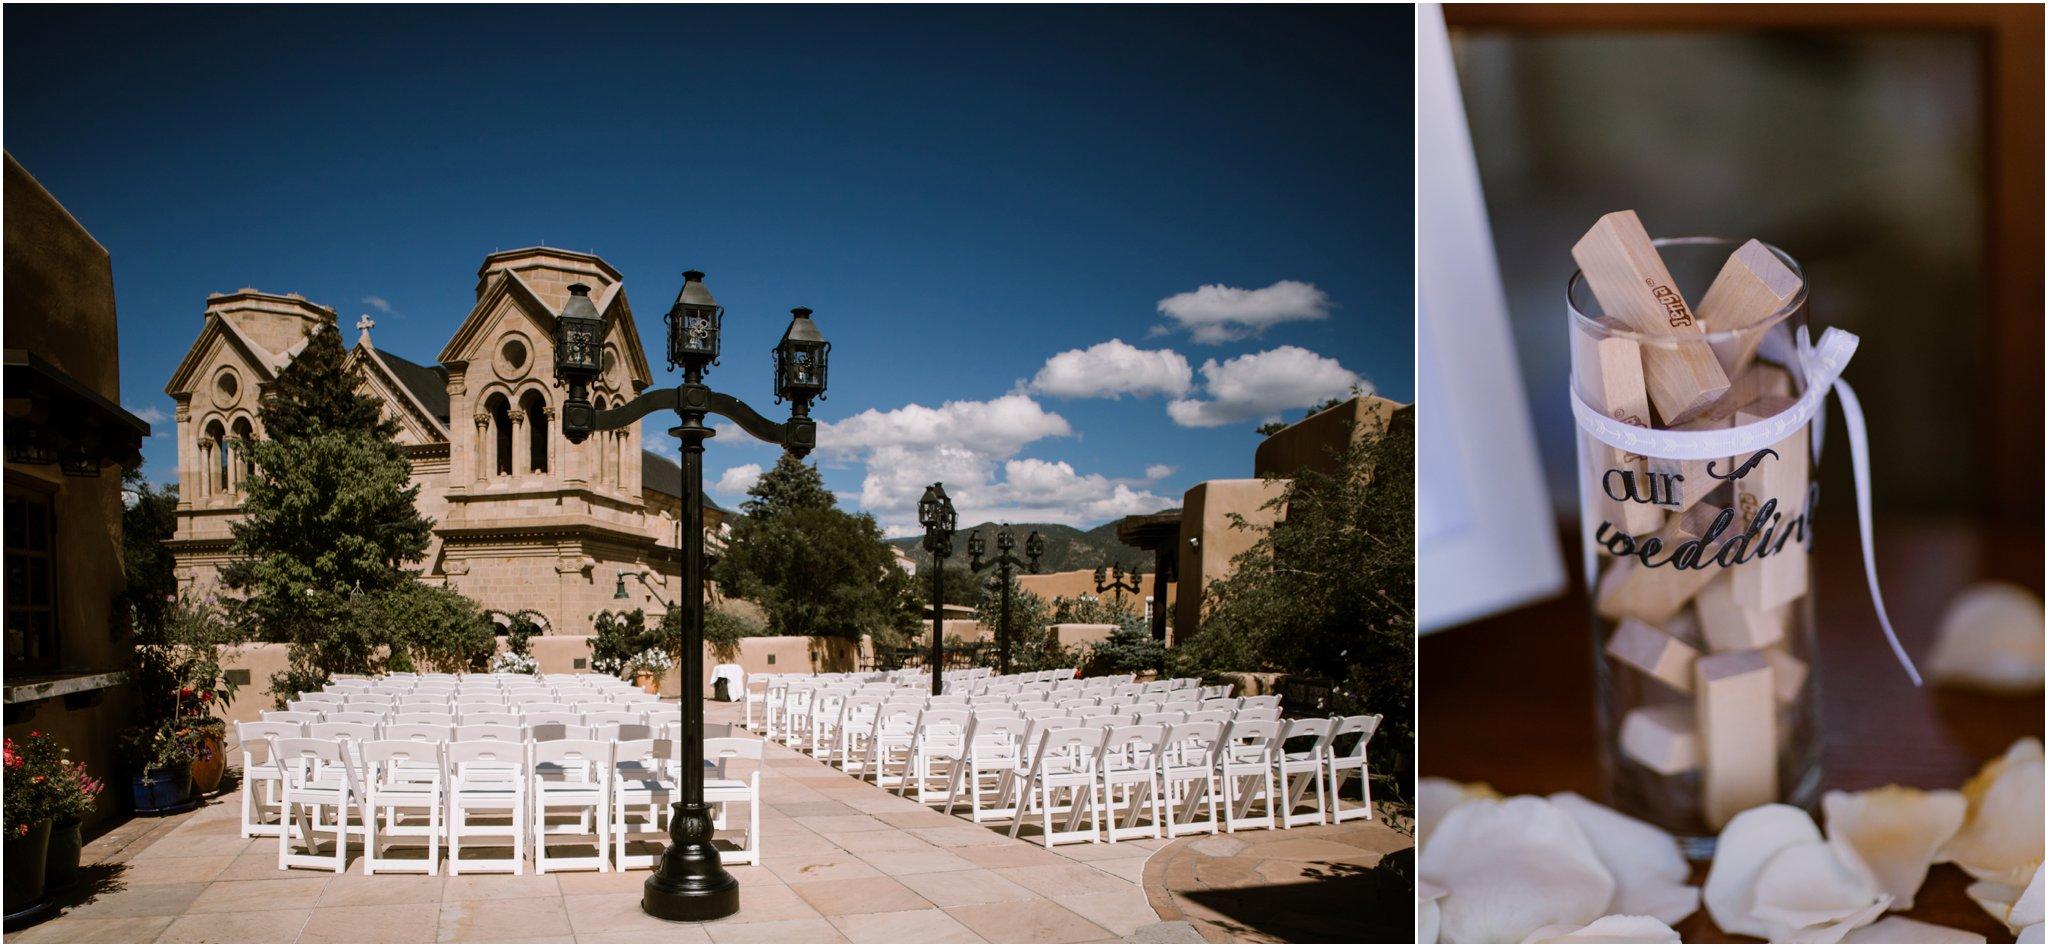 0001La Fonda Weddings Blue Rose Photography Studios